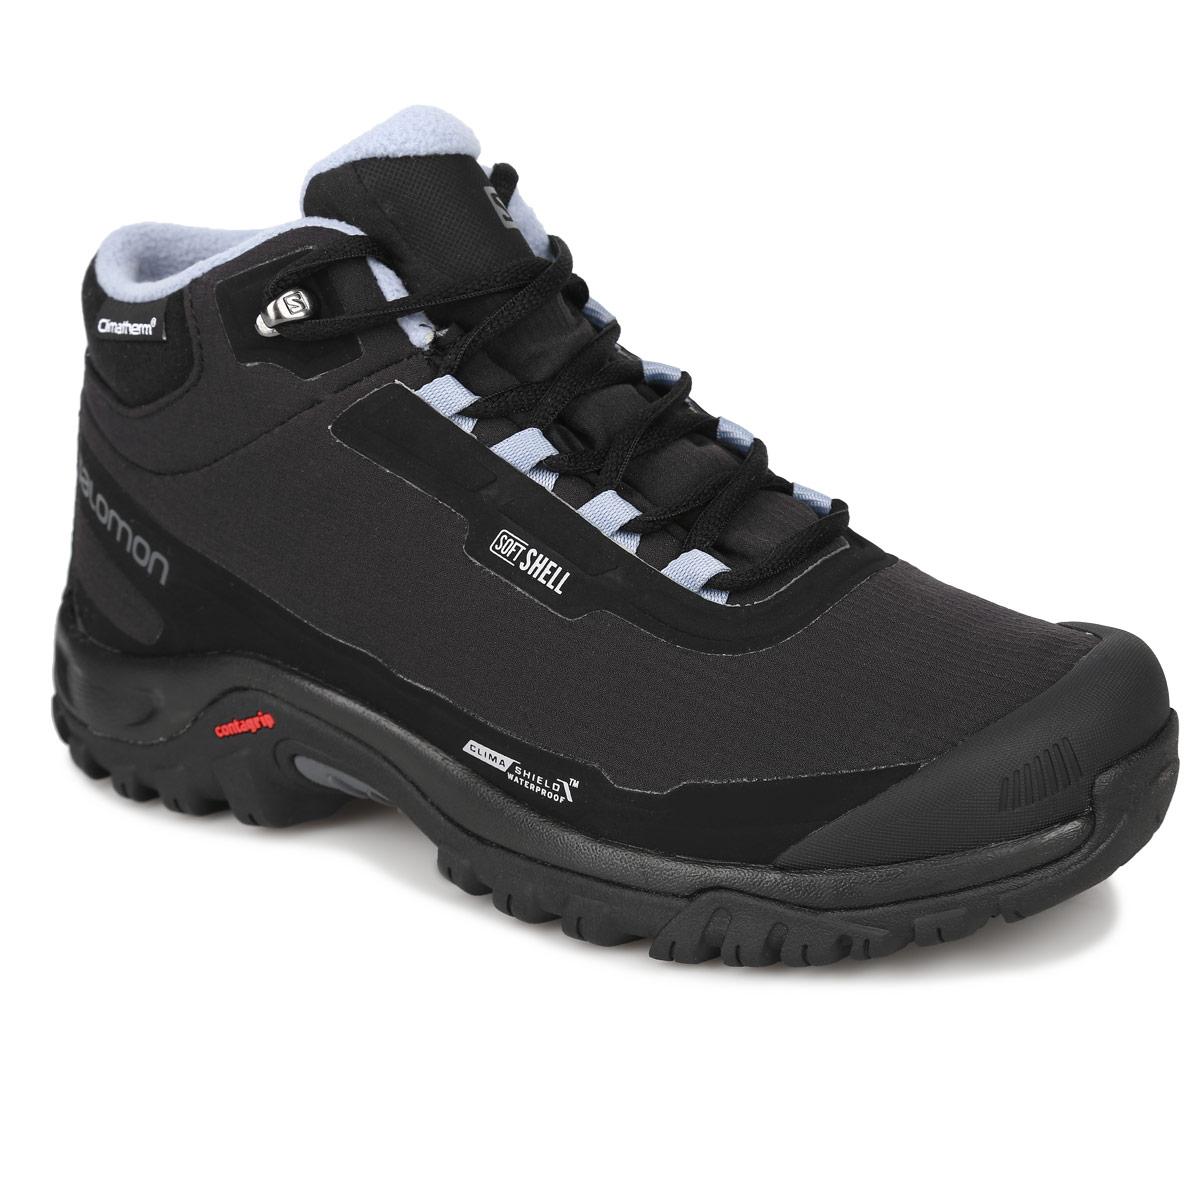 Ботинки женские Shelter. L37687300